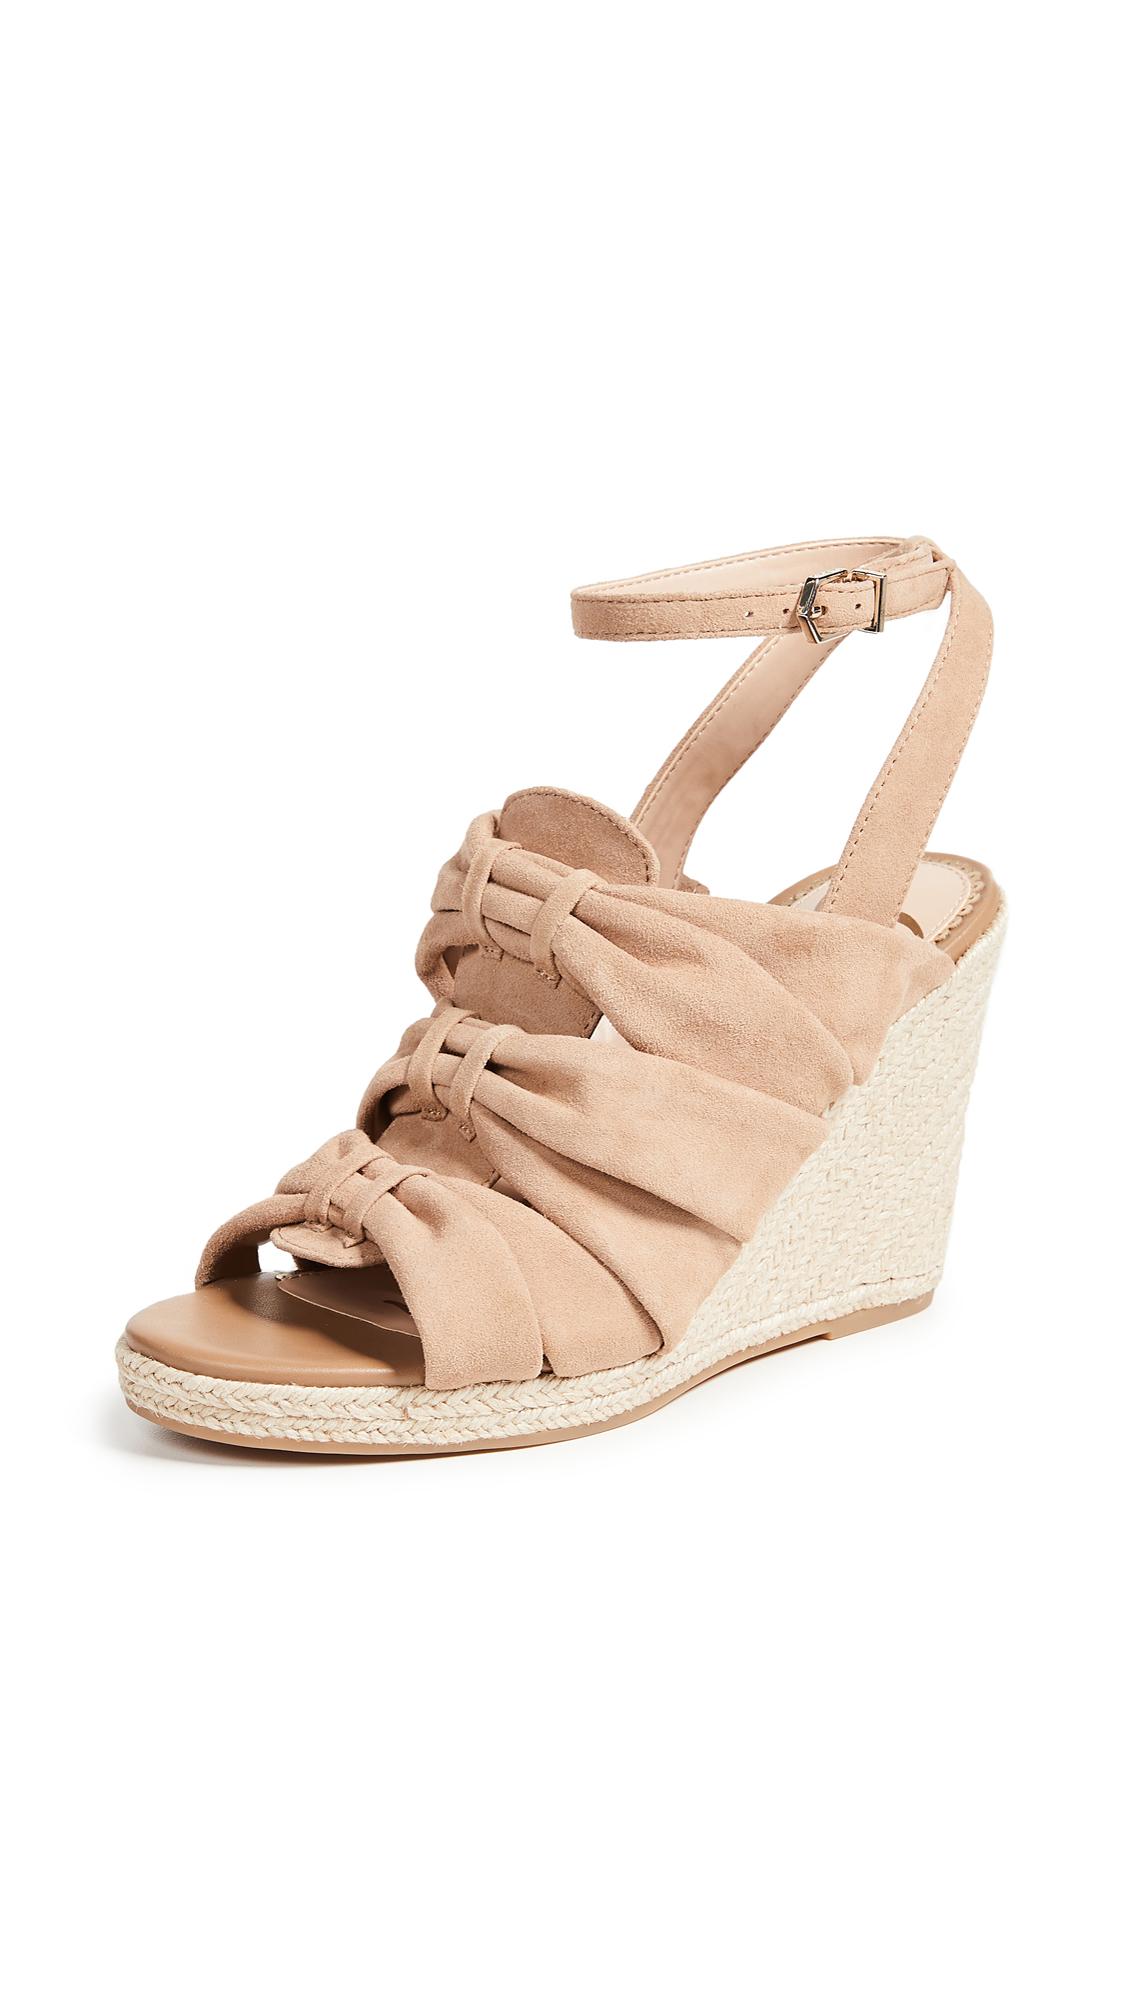 Sam Edelman Awan Wedge Sandals